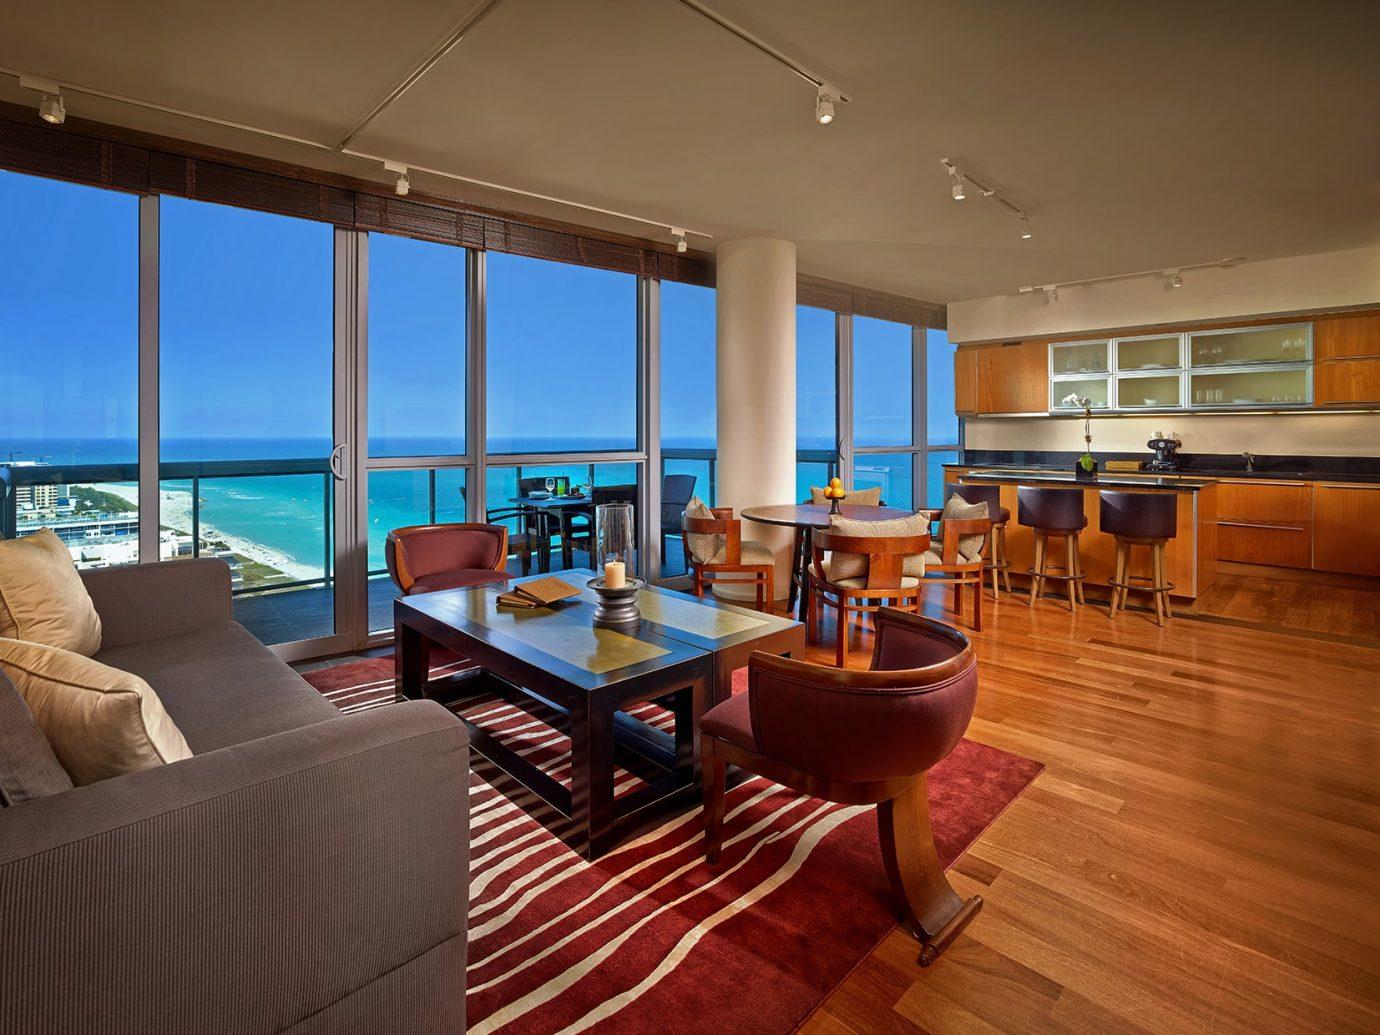 Living room and beach view at the Setai Miami Beach